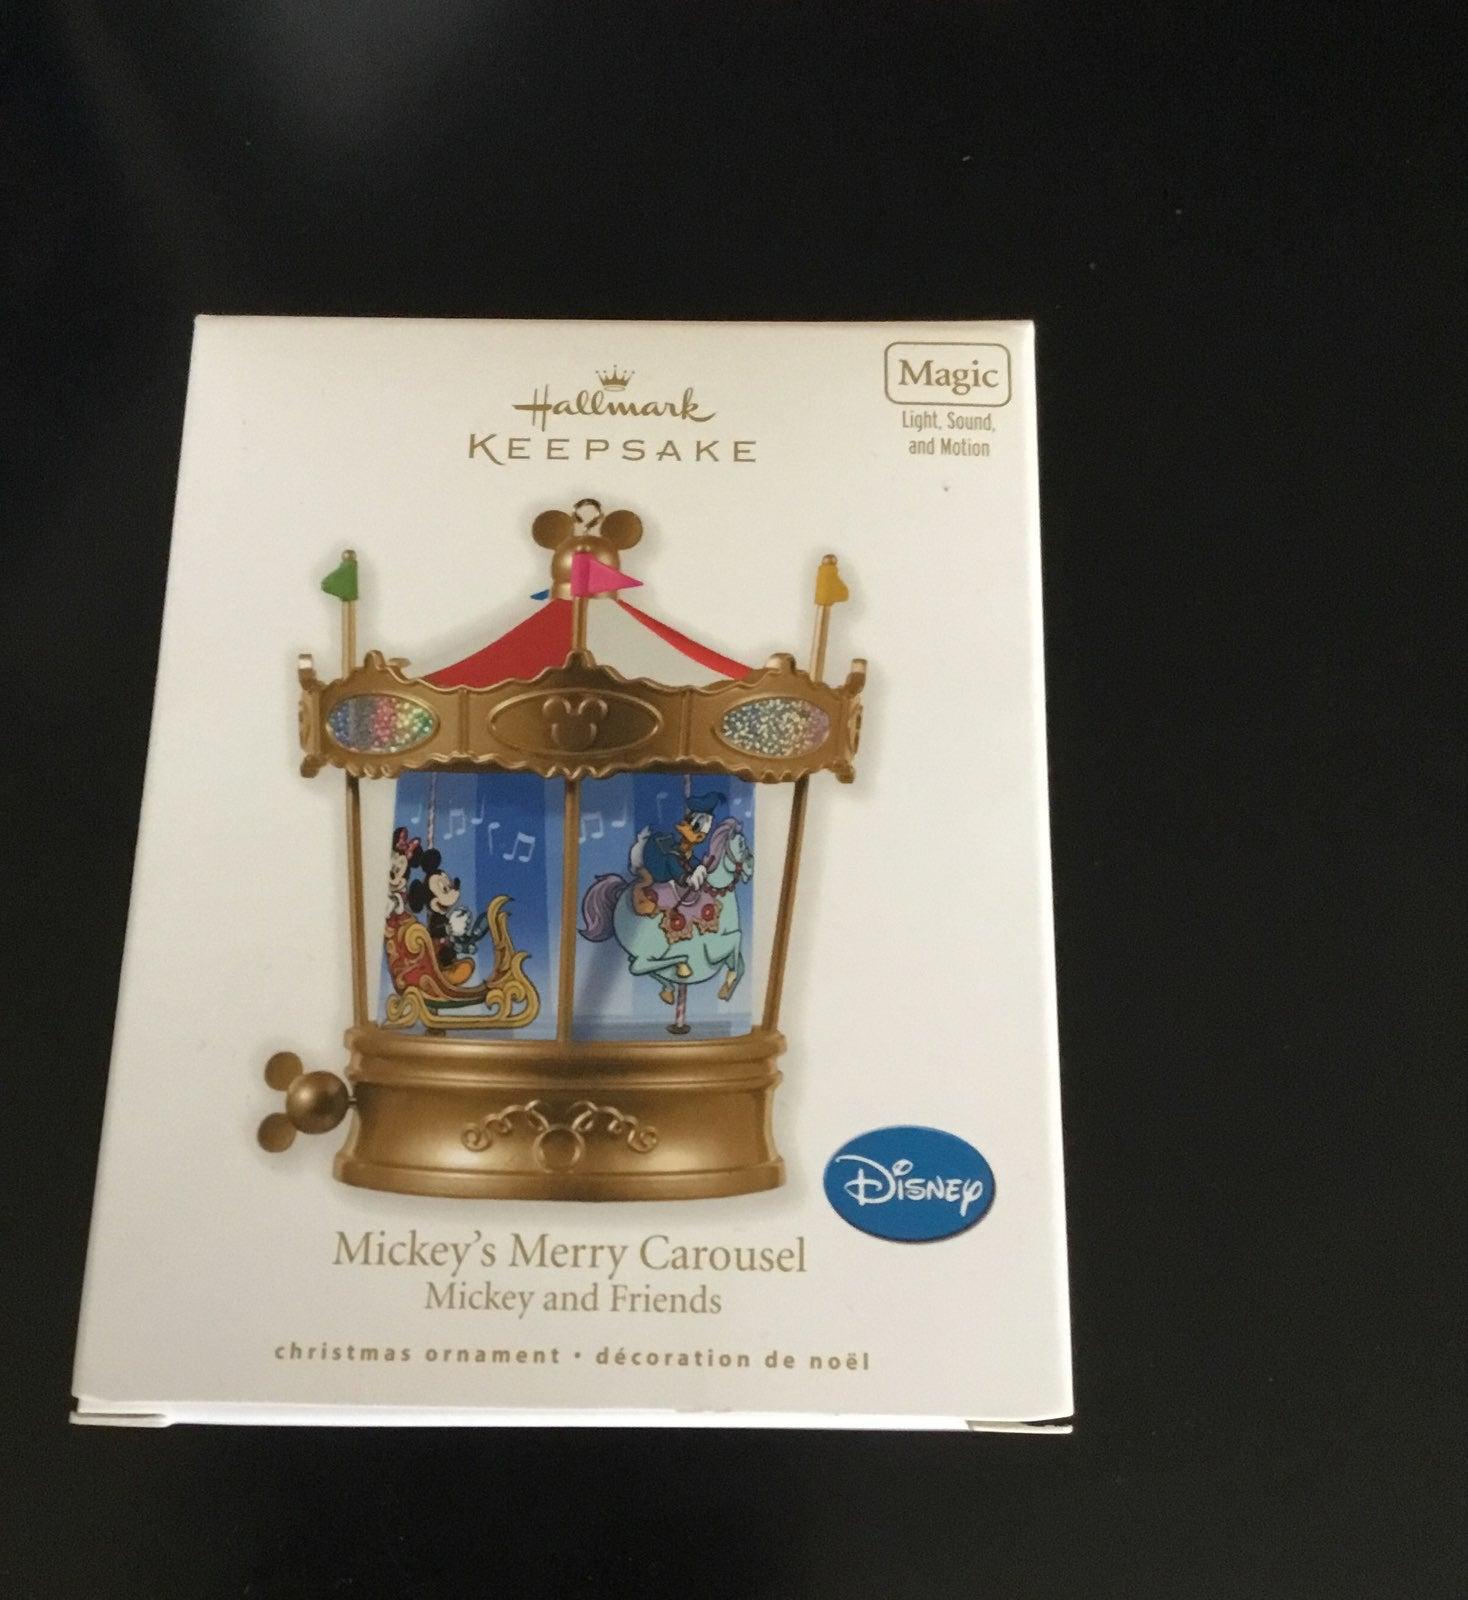 Hallmark Disney Mickey's Merry Carousel